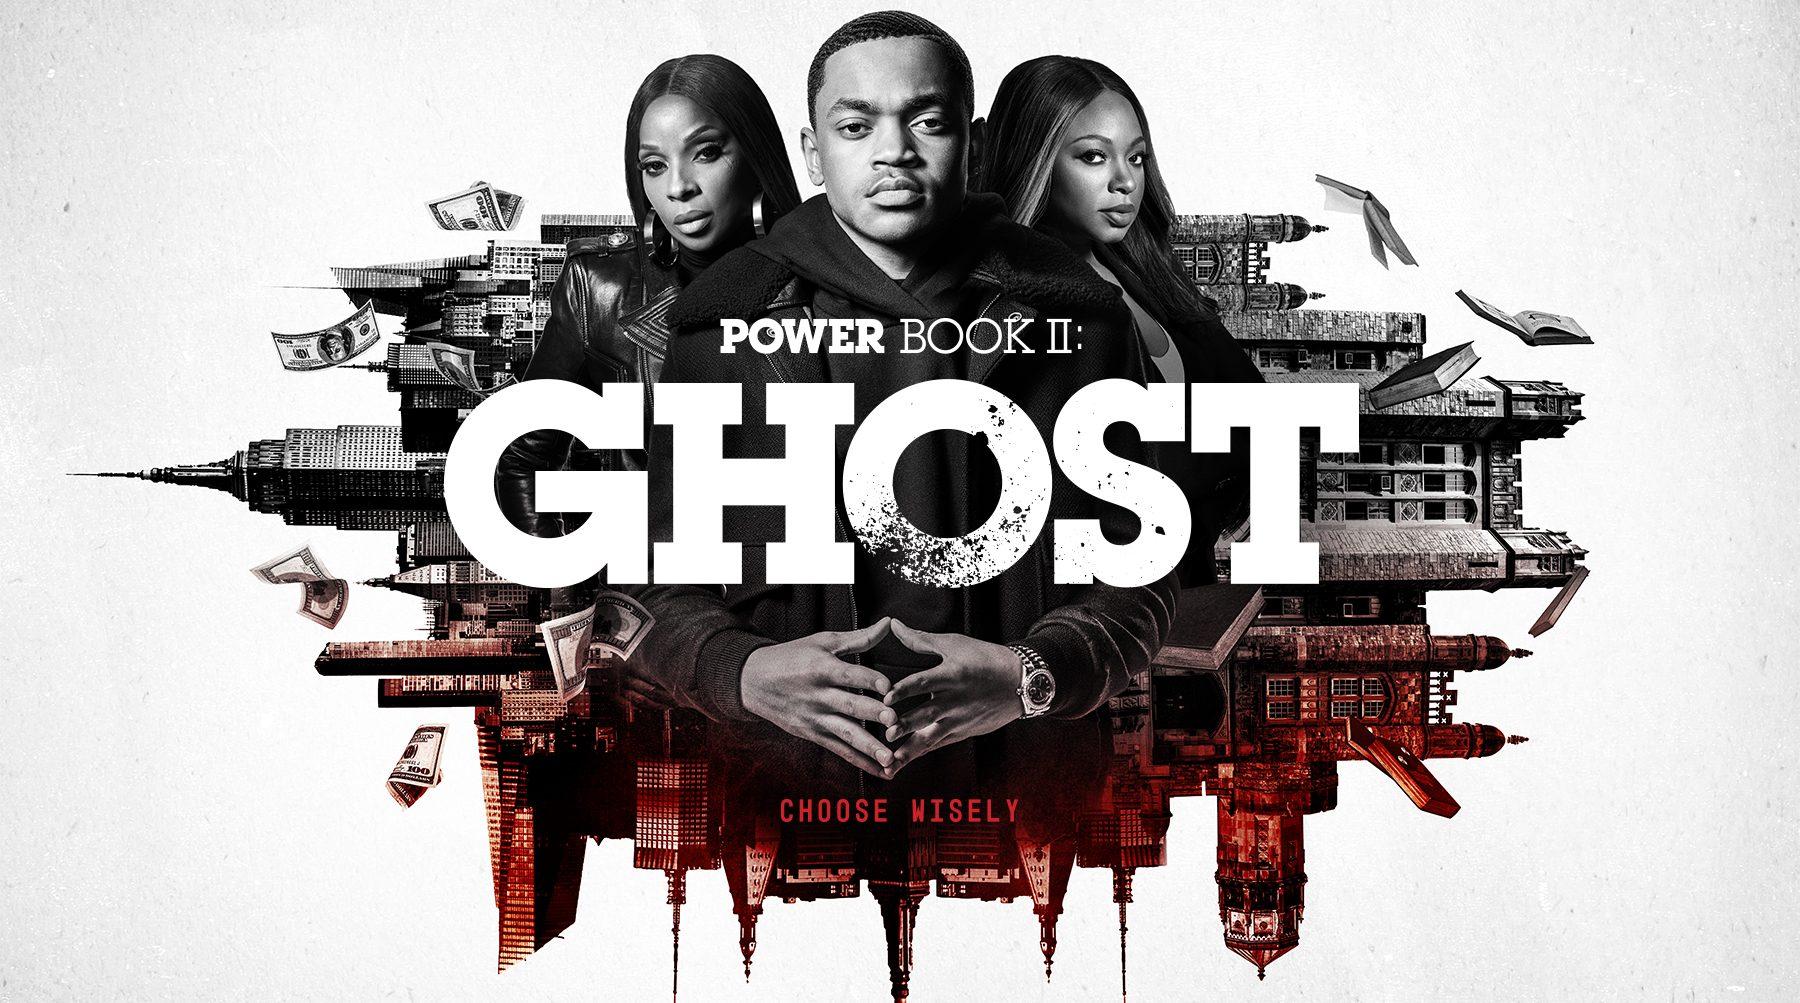 Power Book II: Ghost update